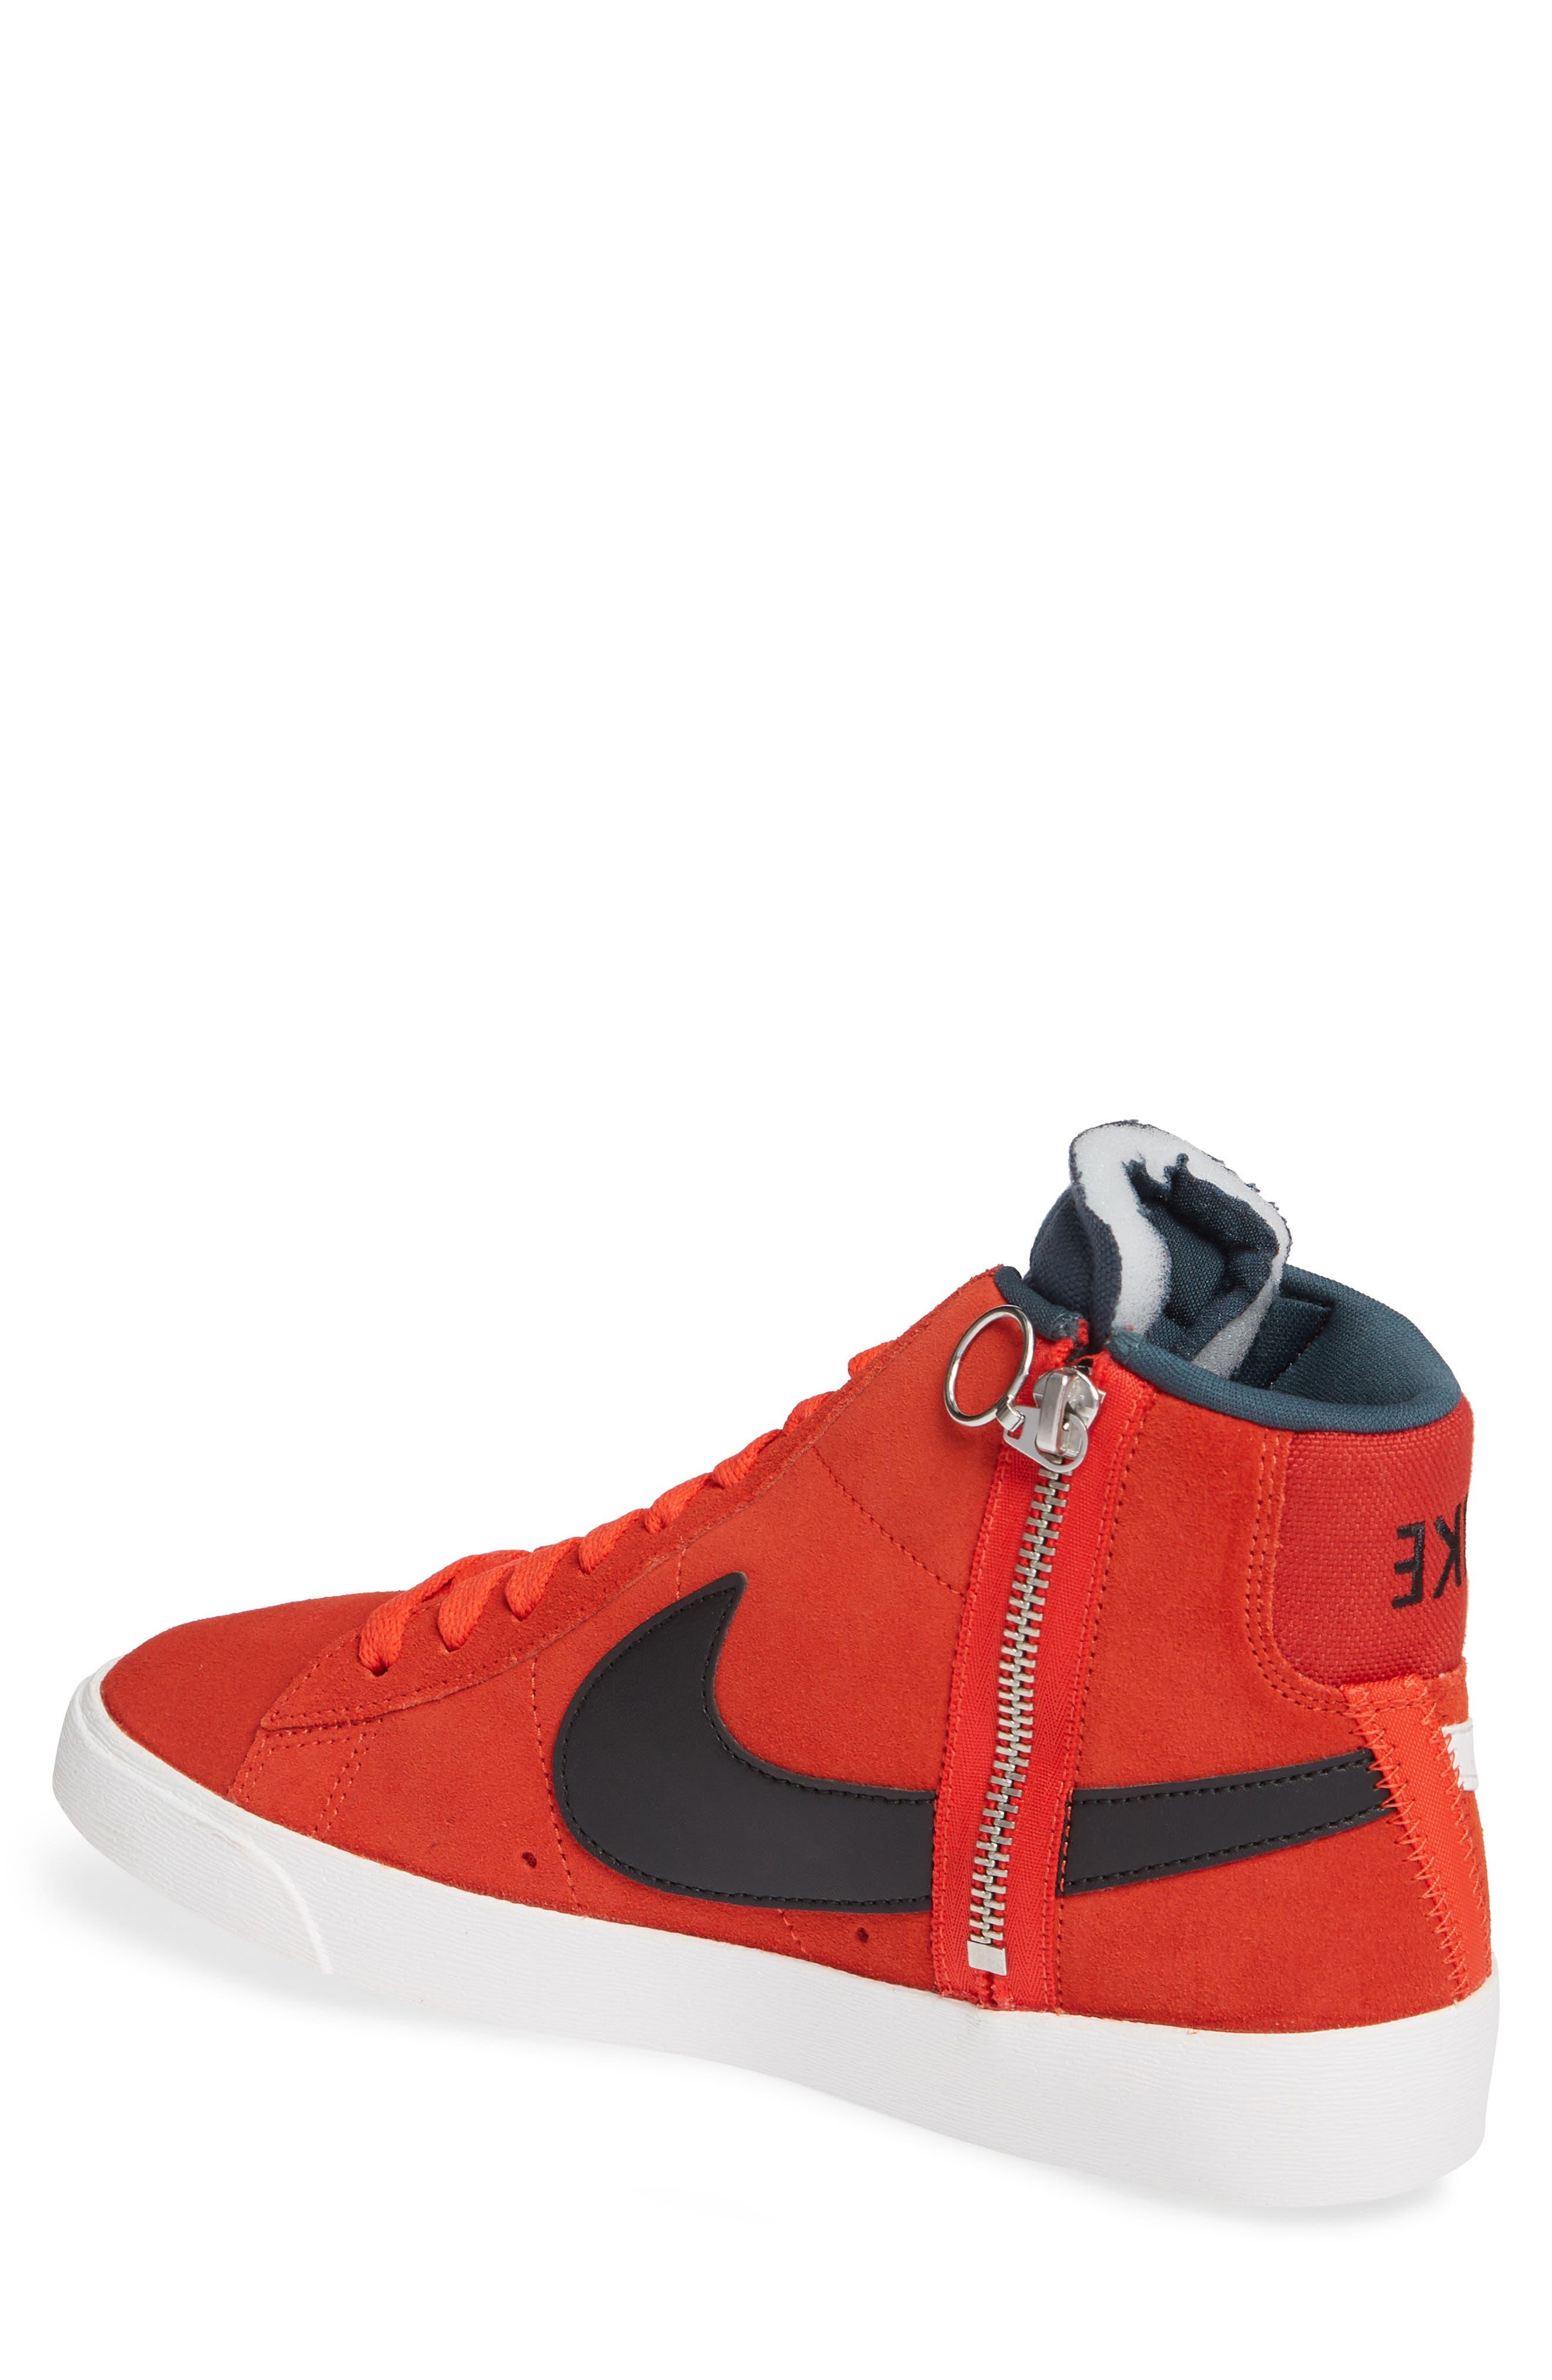 Blazer Mid Rebel Sneaker,                             Alternate thumbnail 2, color,                             HABANERO/ WHITE/ BLACK/ SPRUCE